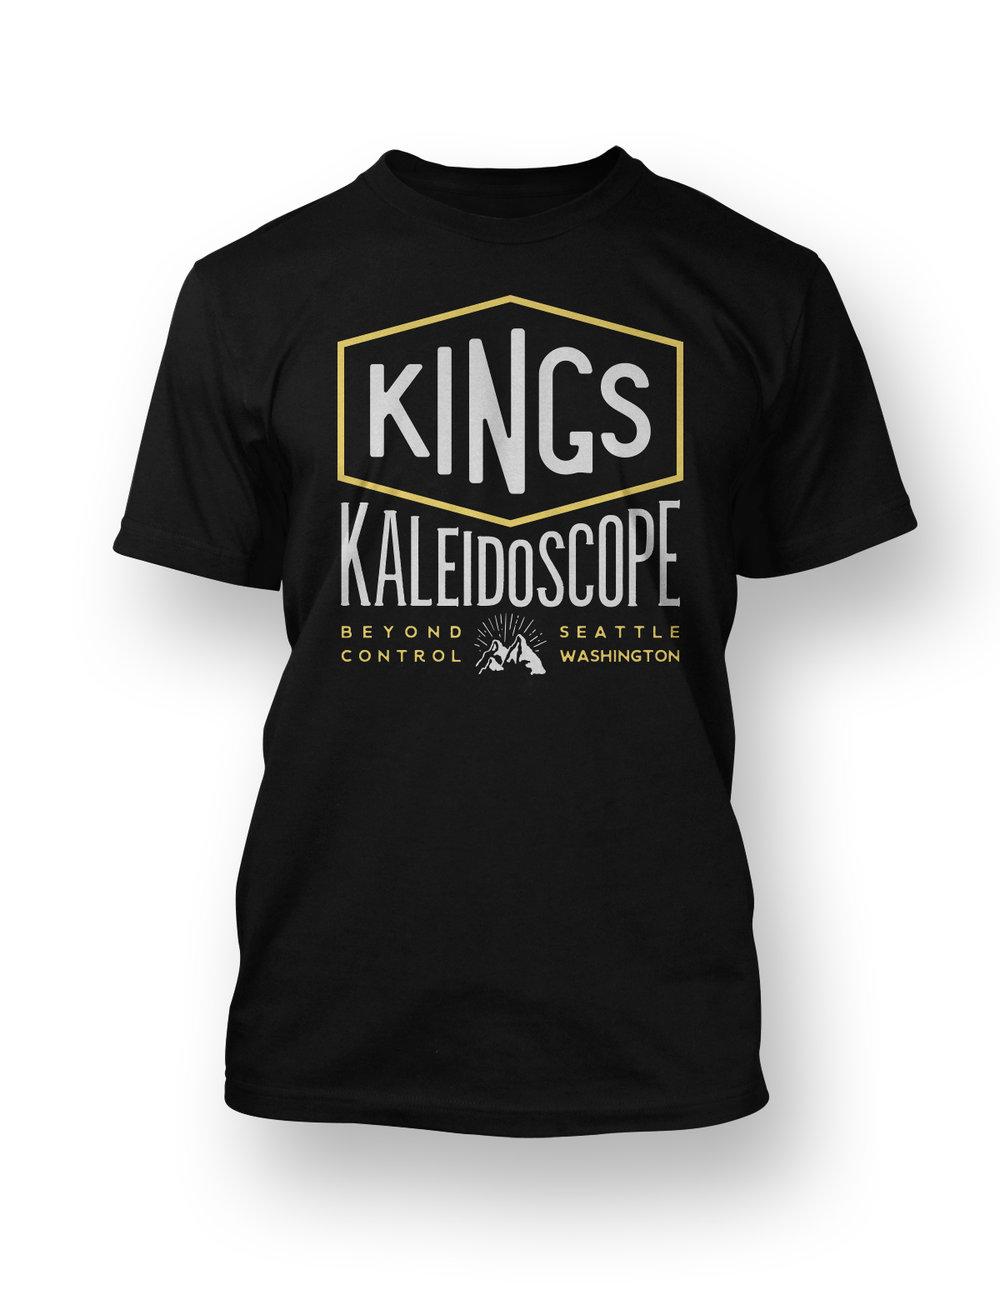 kings-shirt-v3-mockup.jpg